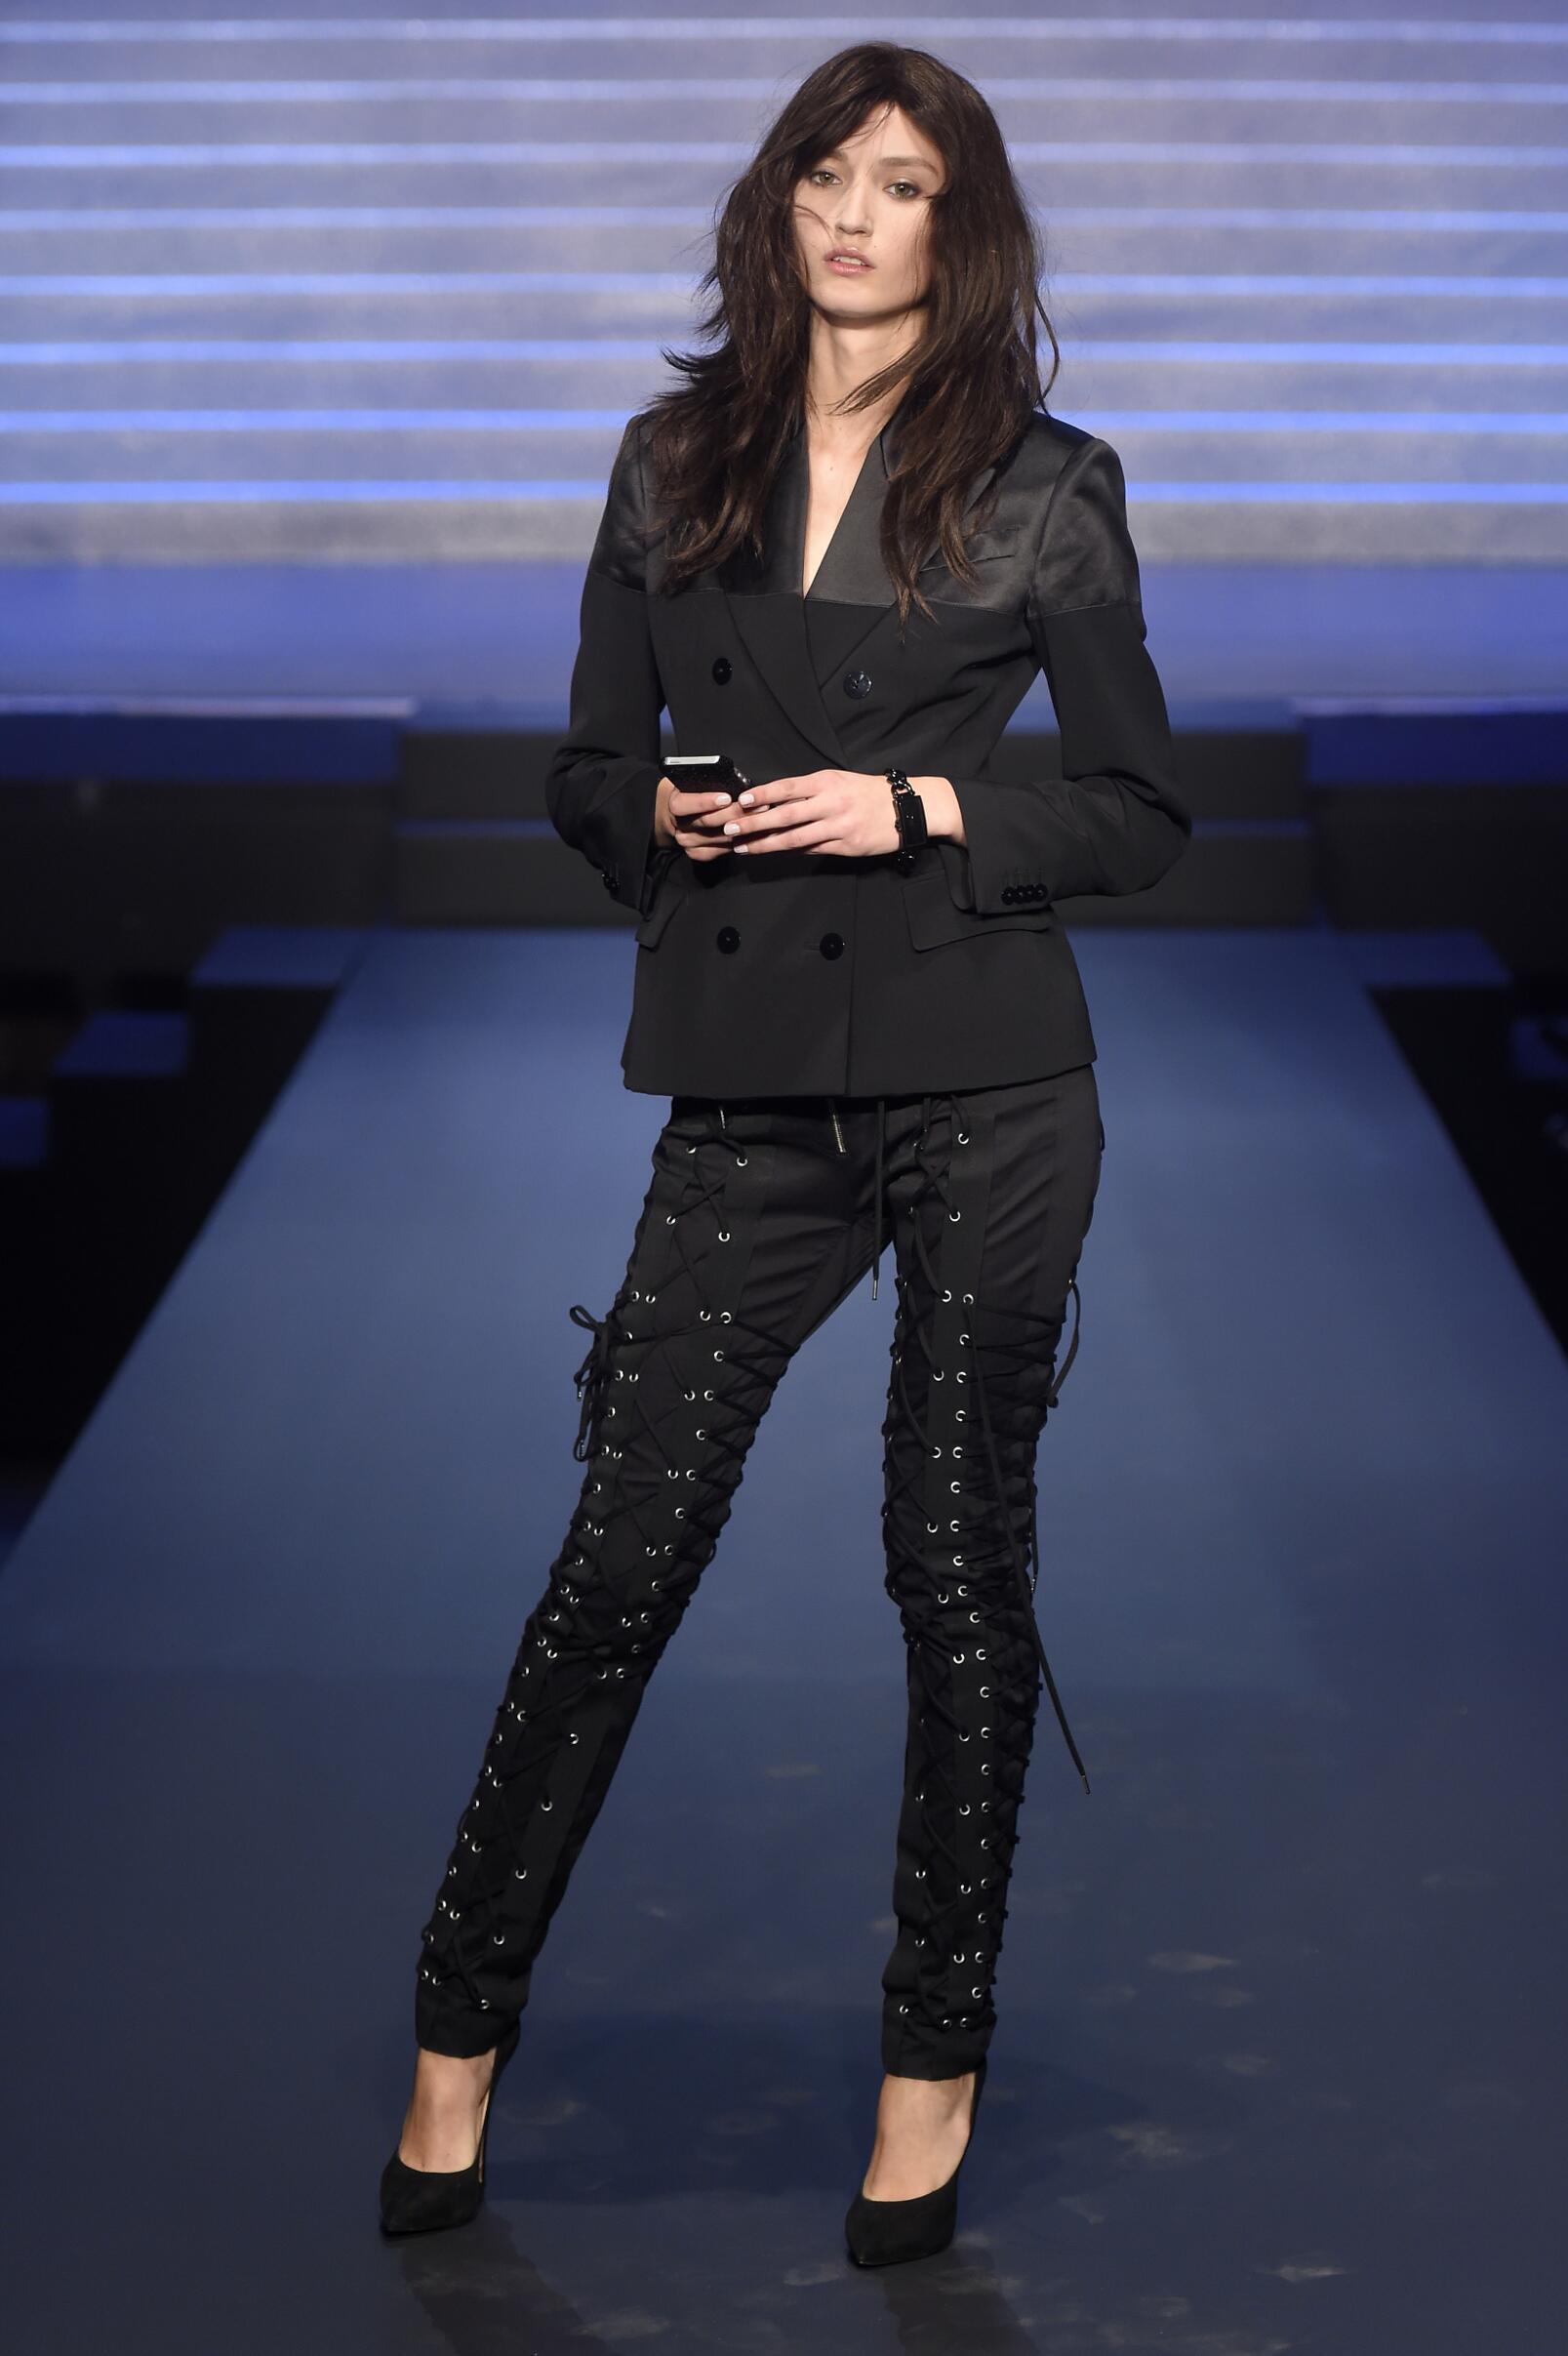 2015 Catwalk Jean Paul Gaultier Woman Fashion Show Summer